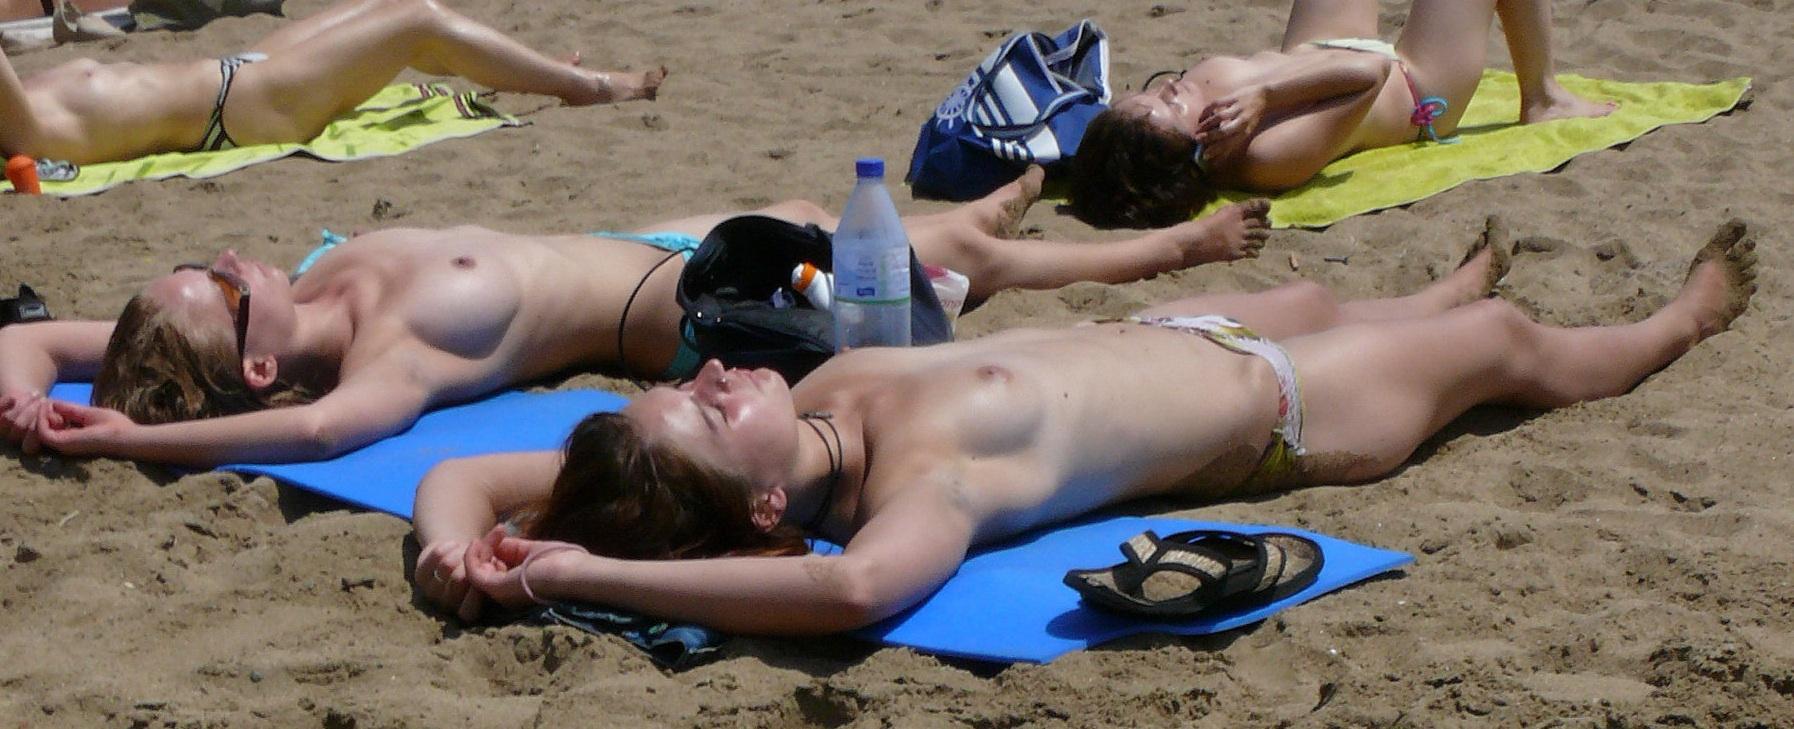 barcelona playa Nude beach de